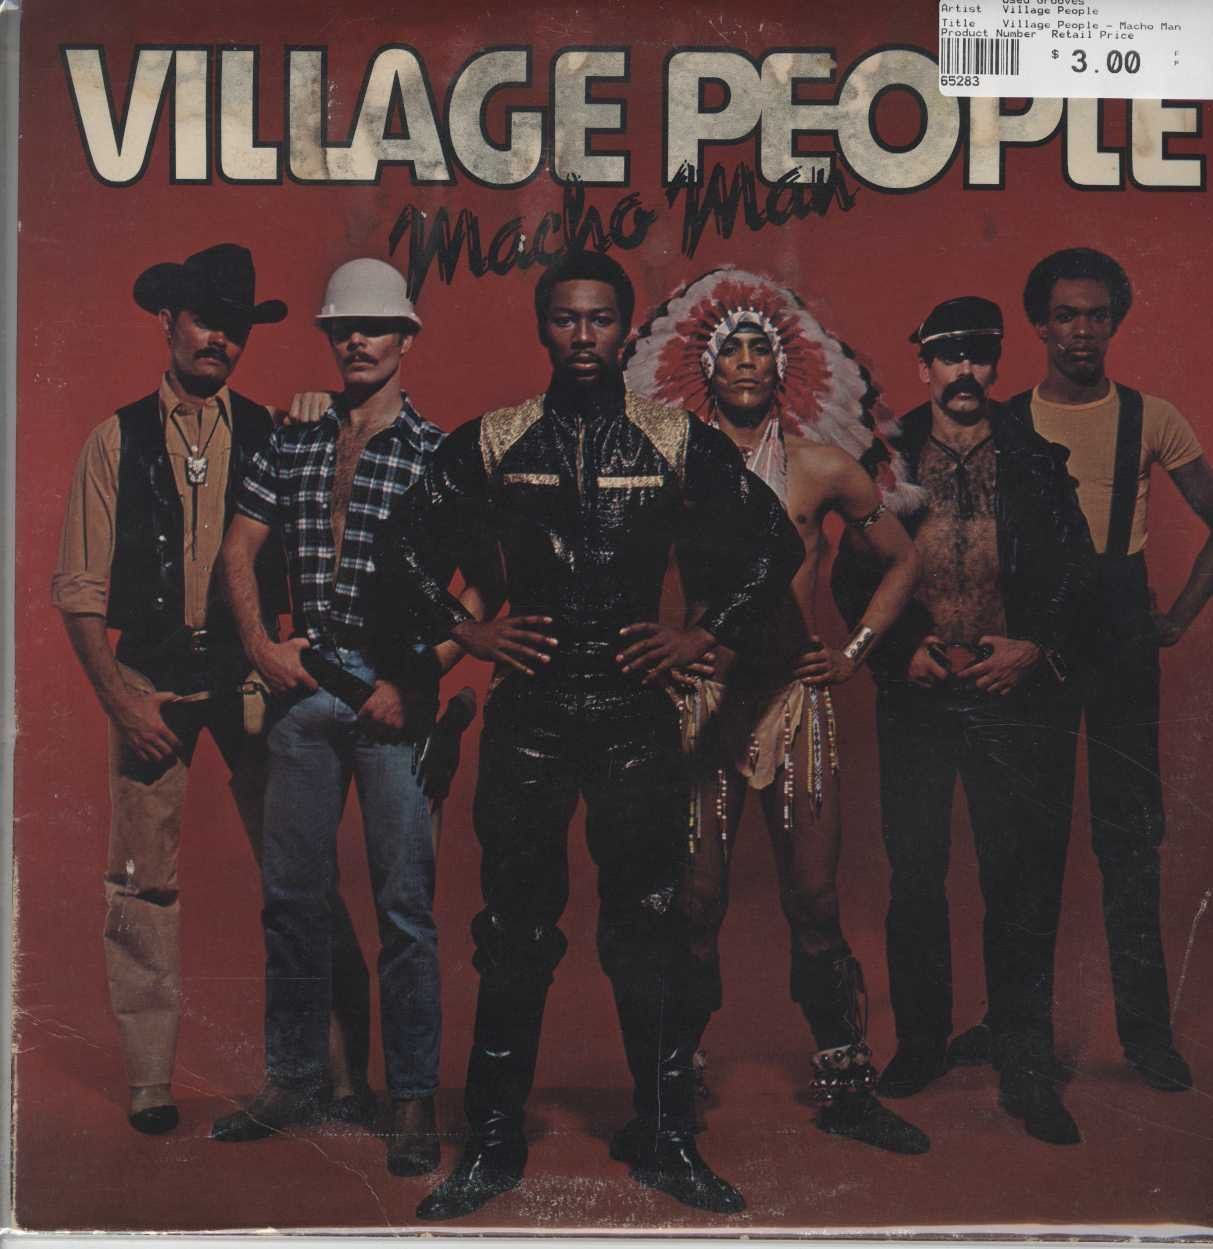 Village People Macho Man Village People Macho Man My Childhood Memories